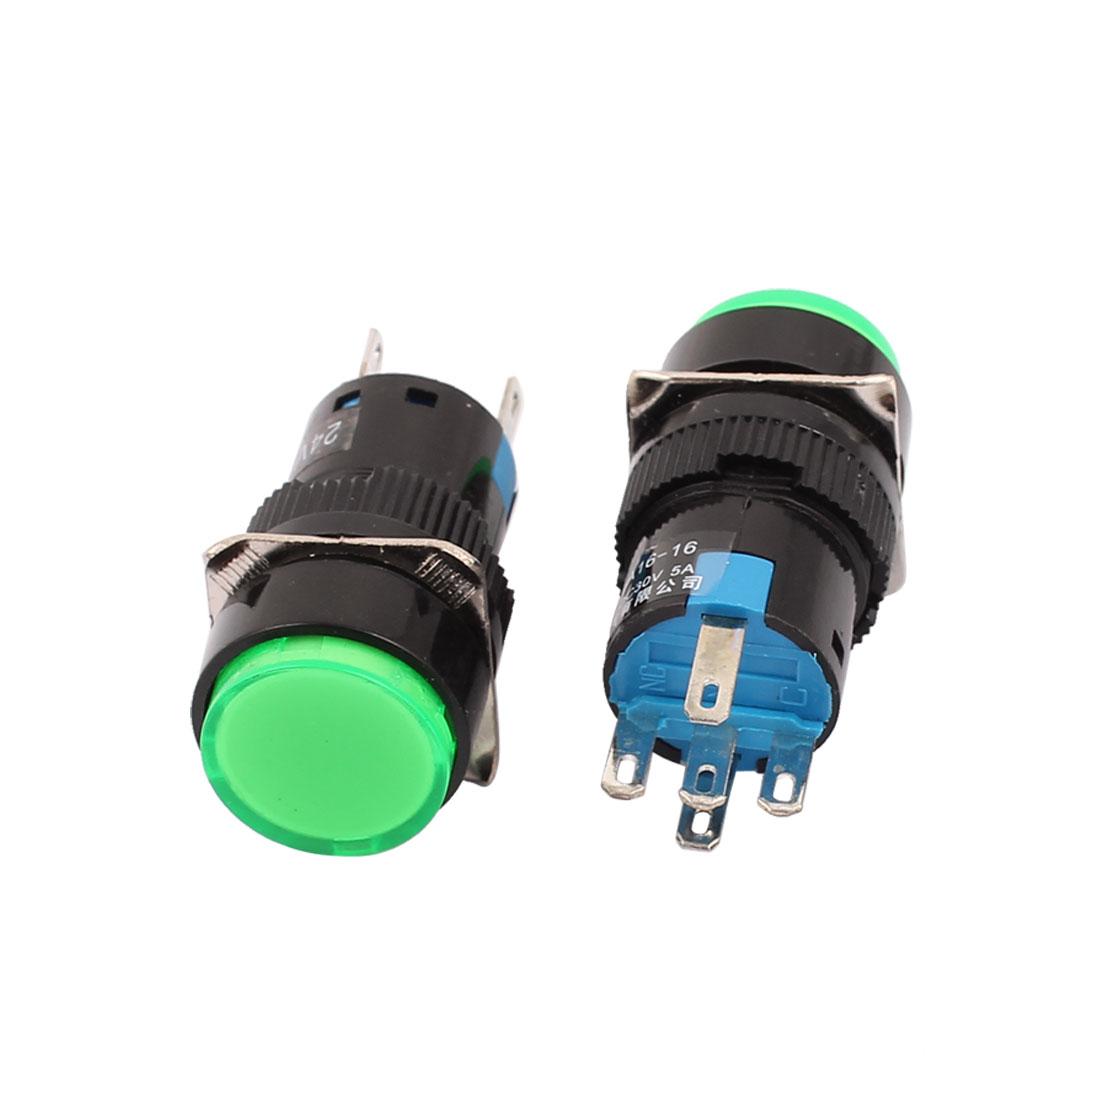 DC 24V Green Light 1NO 1NC Momentary Round Cap Push Button Switch 2 Pcs